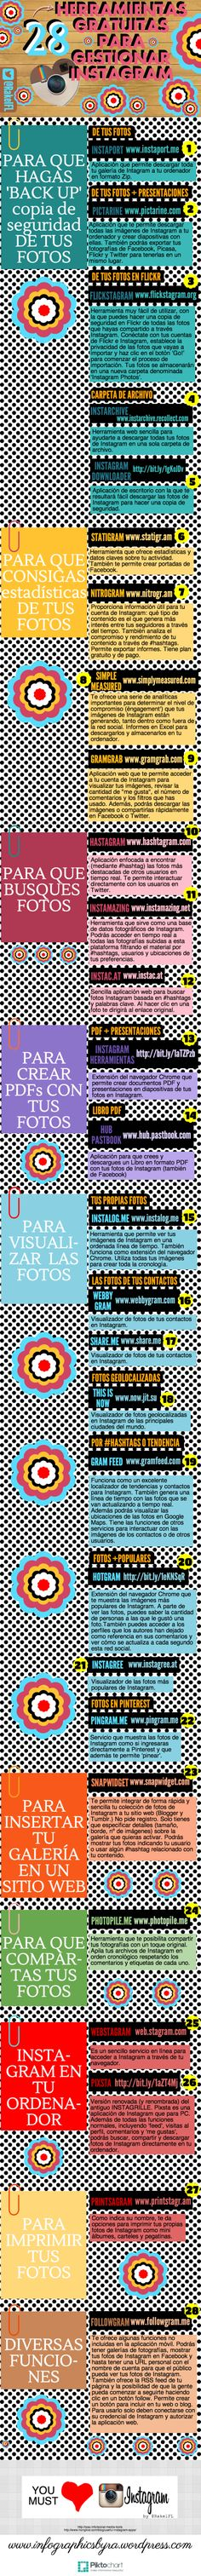 28 herramientas gratuitas para Instagram #infografia #infographic #socialmedia http://ticsyformacion.com/2014/02/06/28-herramientas-gratuitas-para-instagram-infografia-infographic-socialmedia/